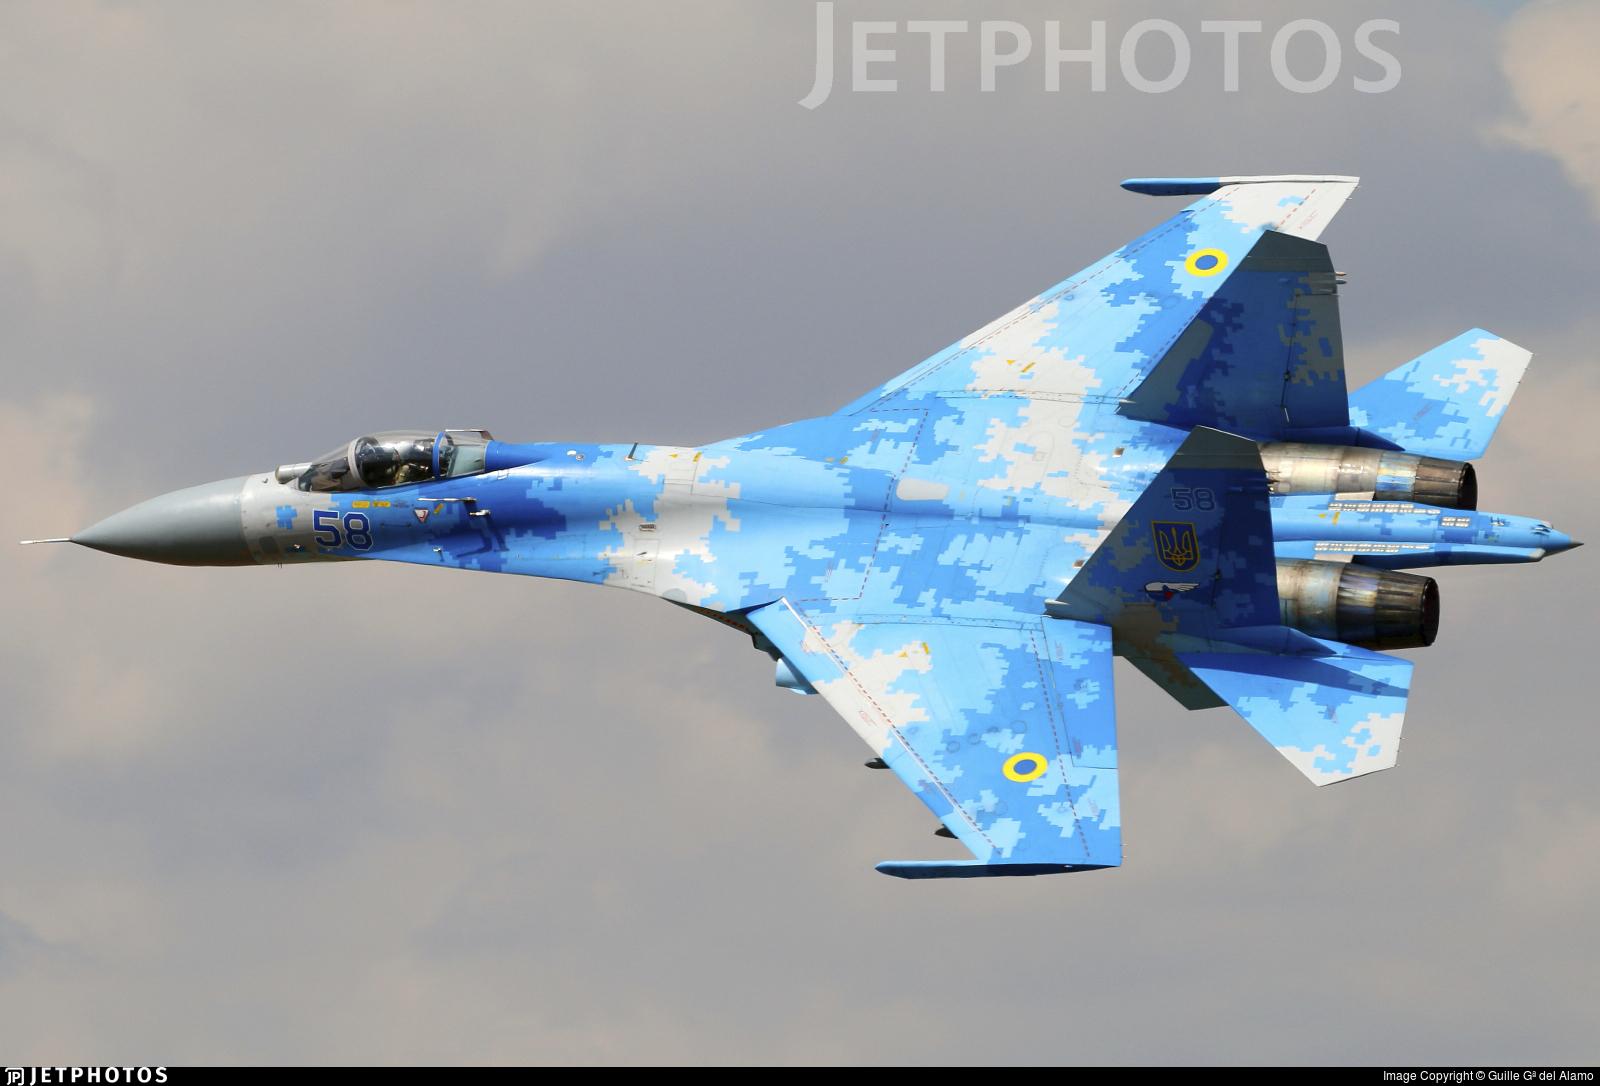 58 - Sukhoi Su-27P Flanker - Ukraine - Air Force